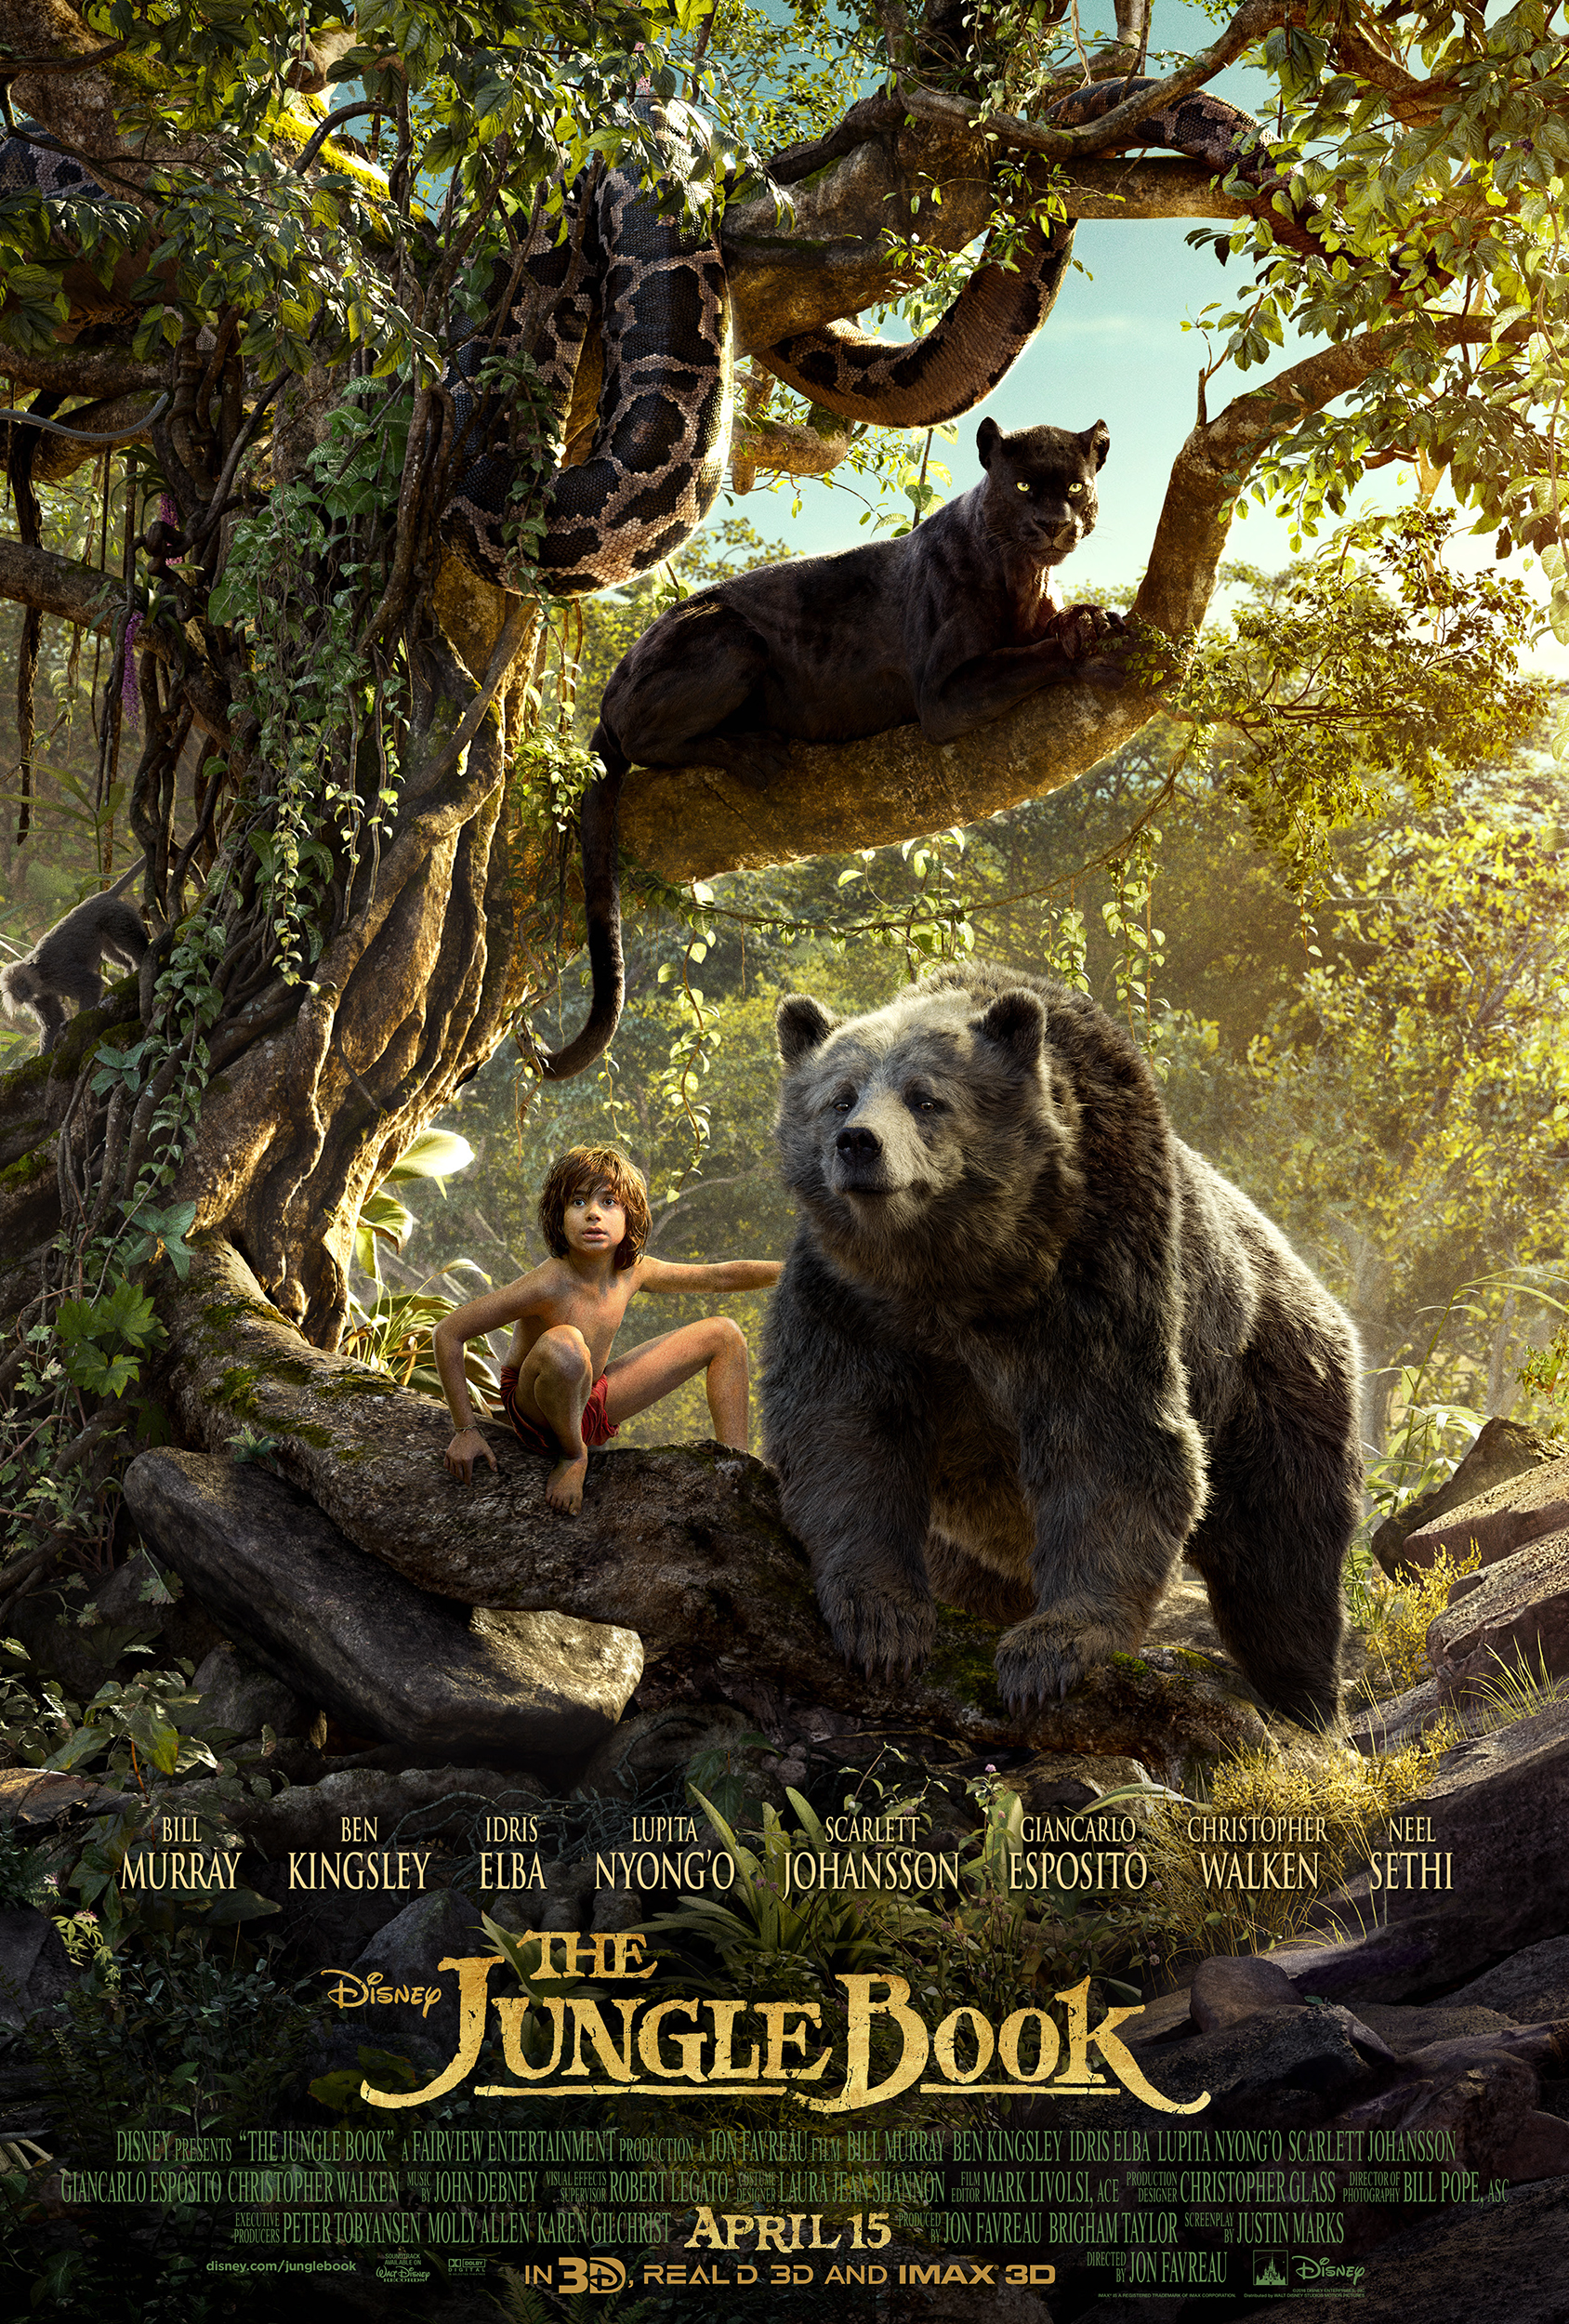 We Celebrate The Jungle Book As Rudyard Kipling Turns 150 images